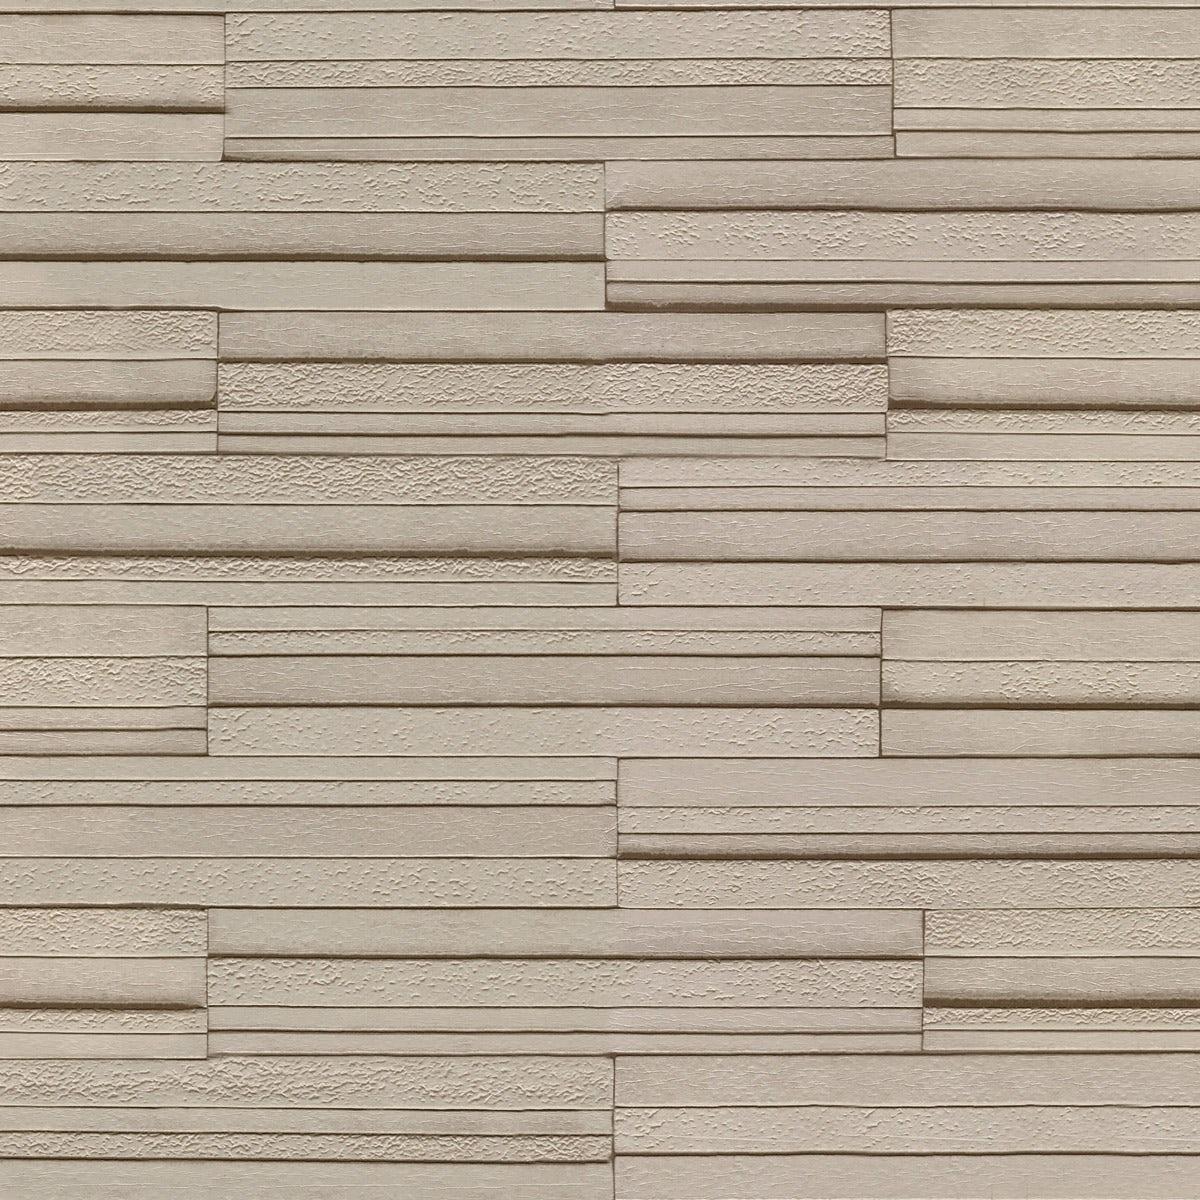 Ceramica Slate Tile - Cream